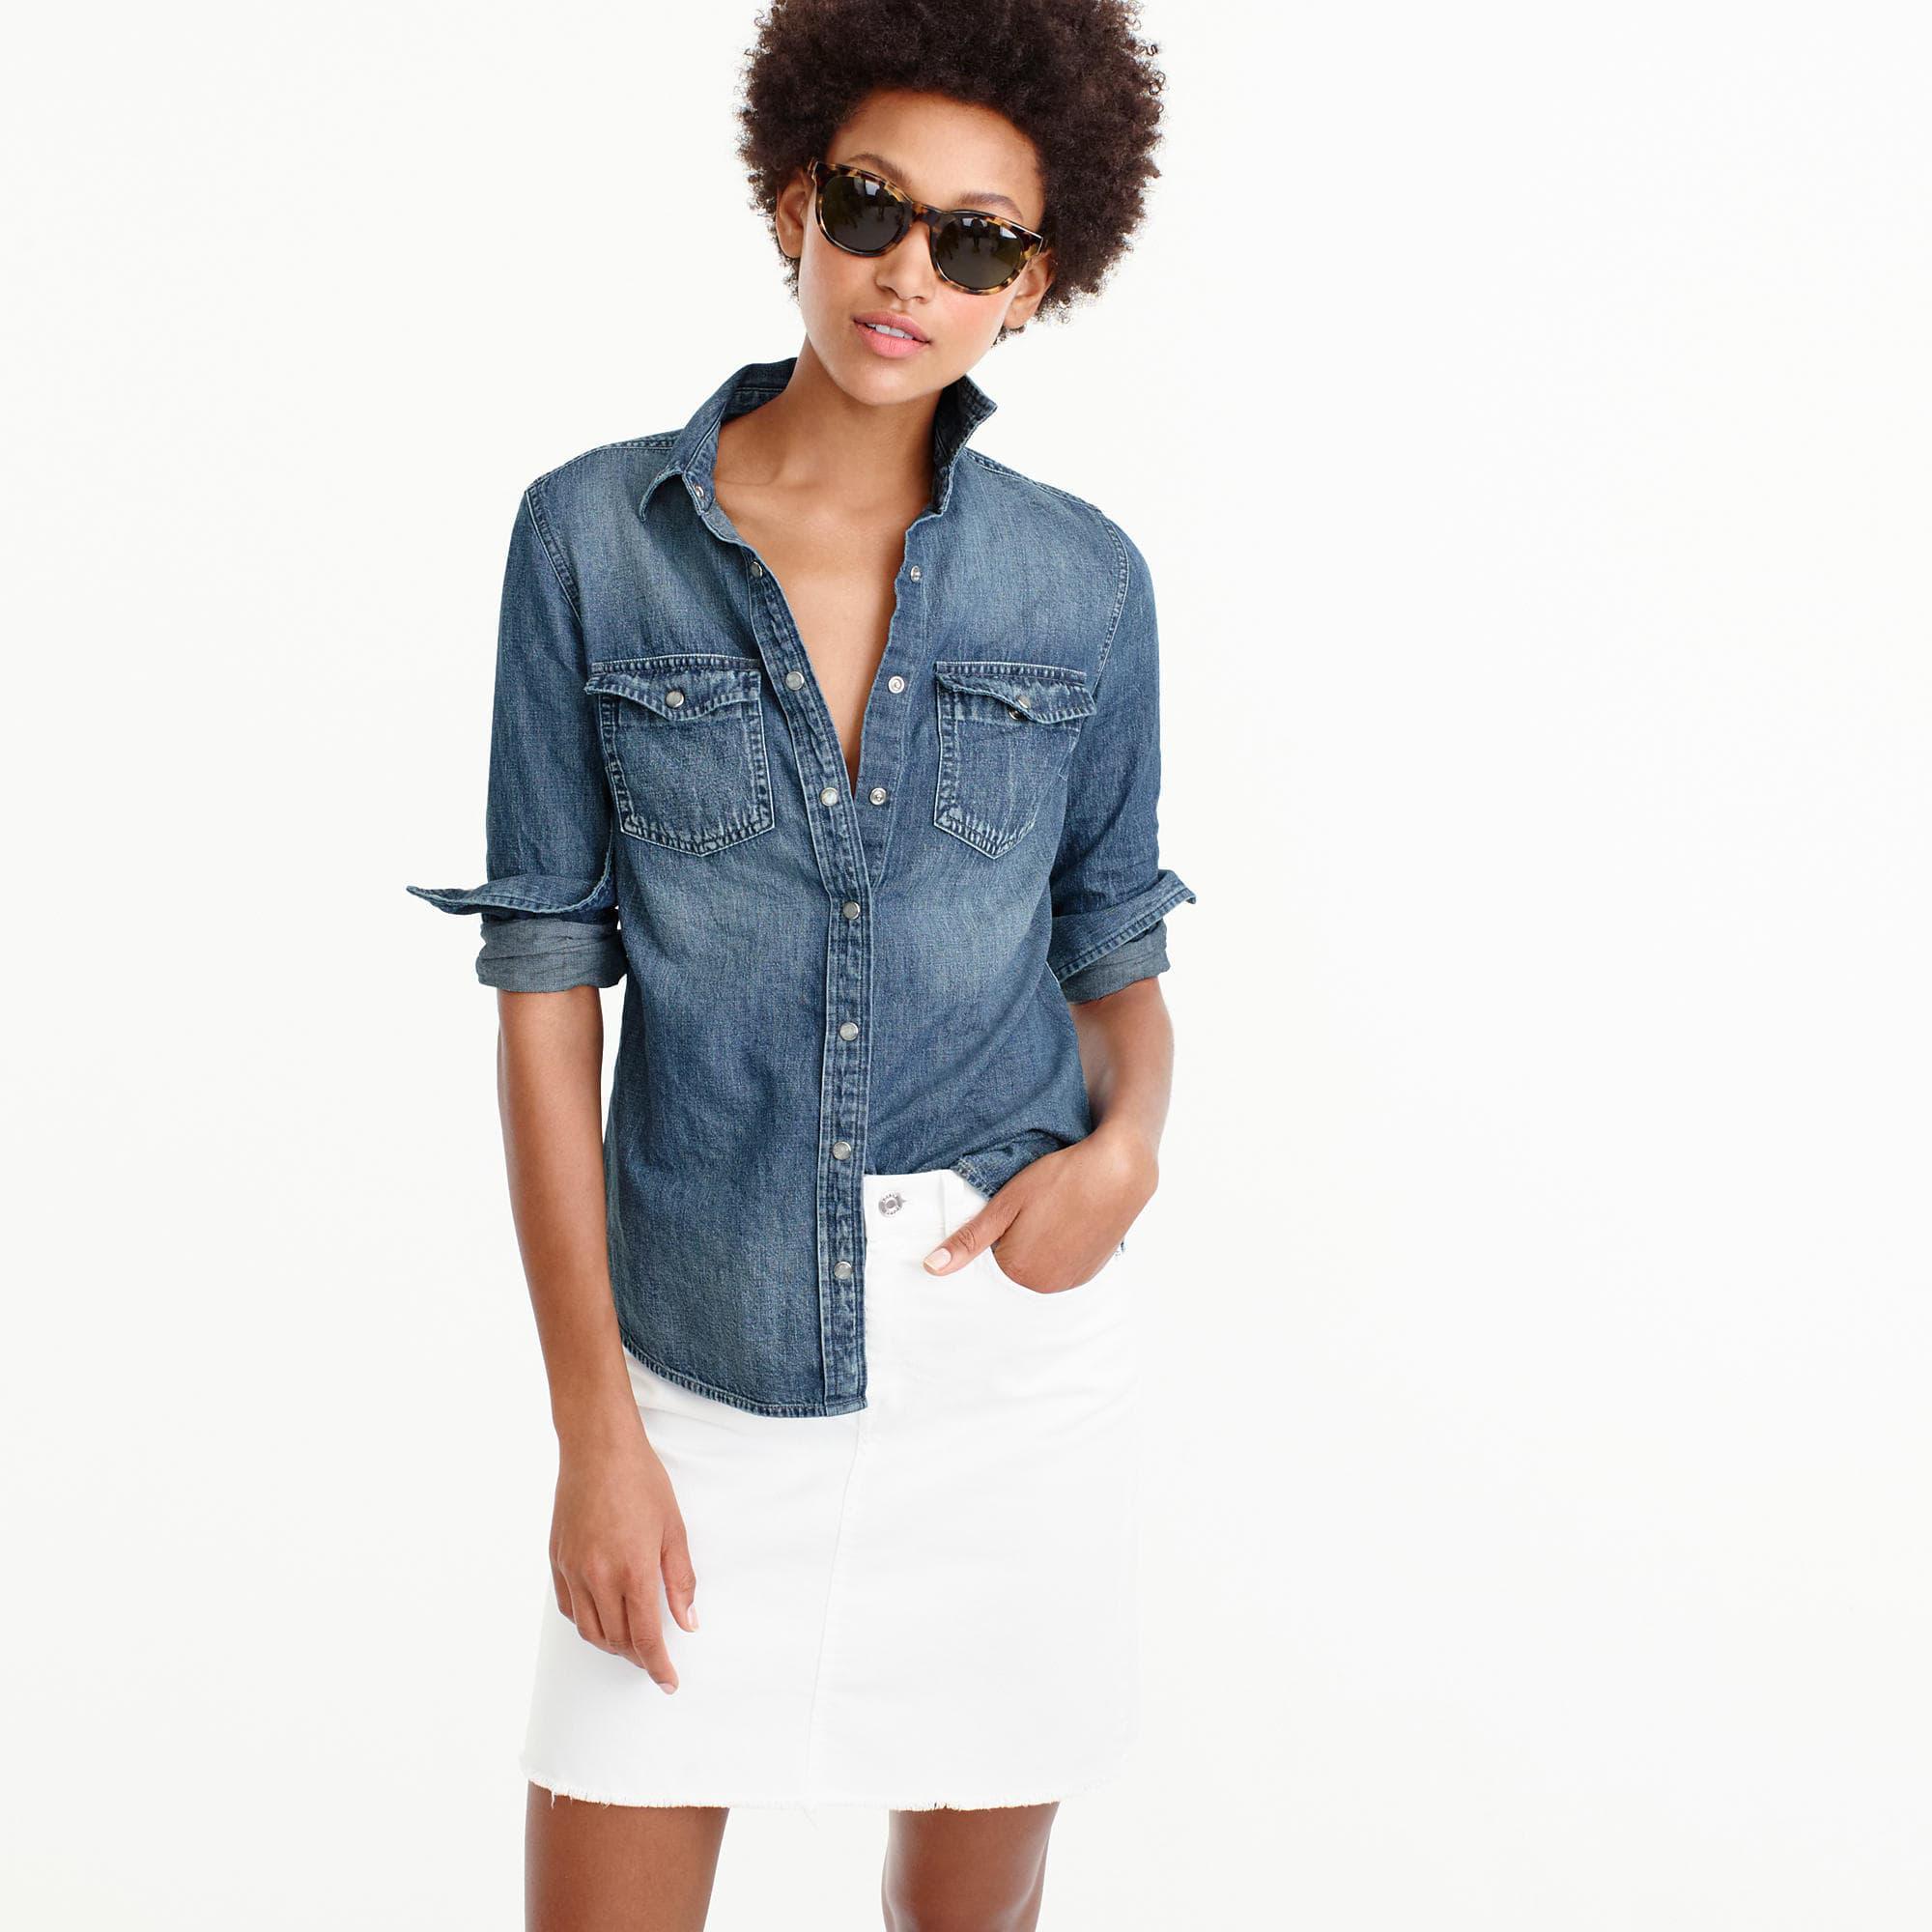 95e77a2ada Women's Blue Western Chambray Shirt In Vintage Indigo